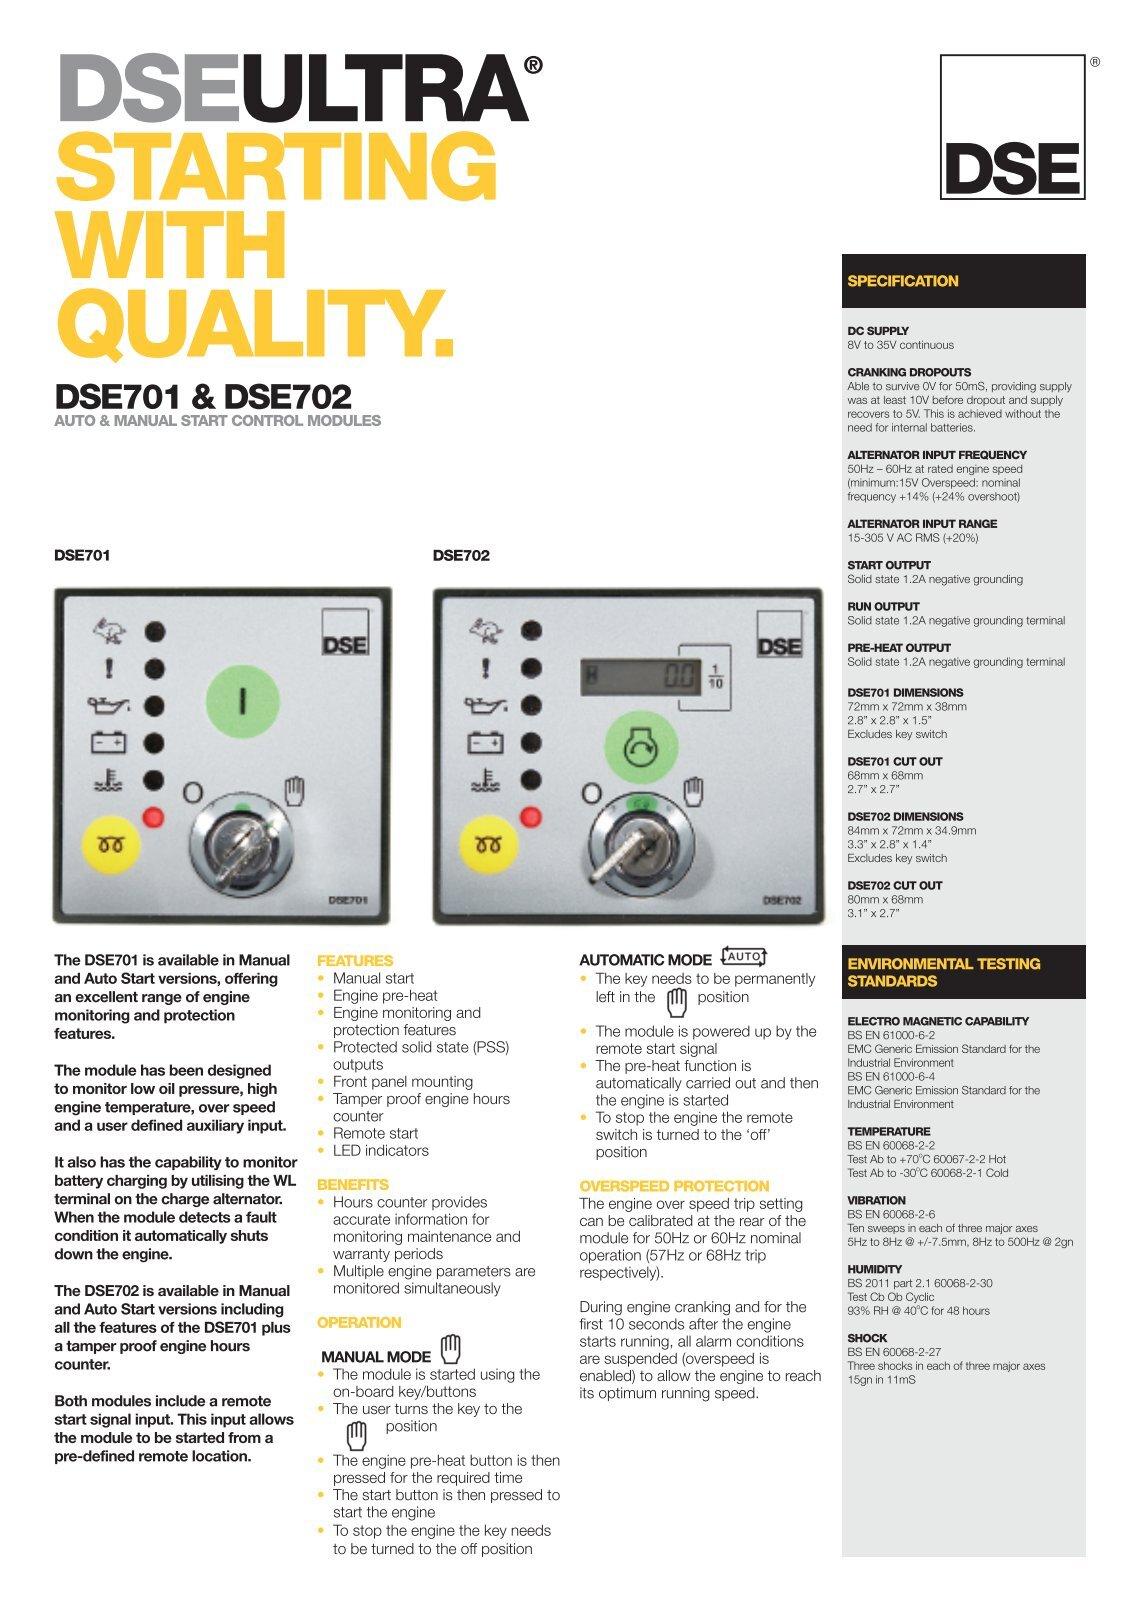 deep sea dse701 manual start moduel brochure?quality\=85 dse701 wiring diagram dse710 \u2022 wiring diagram database woorishop co deep sea 7310 wiring diagram at mifinder.co